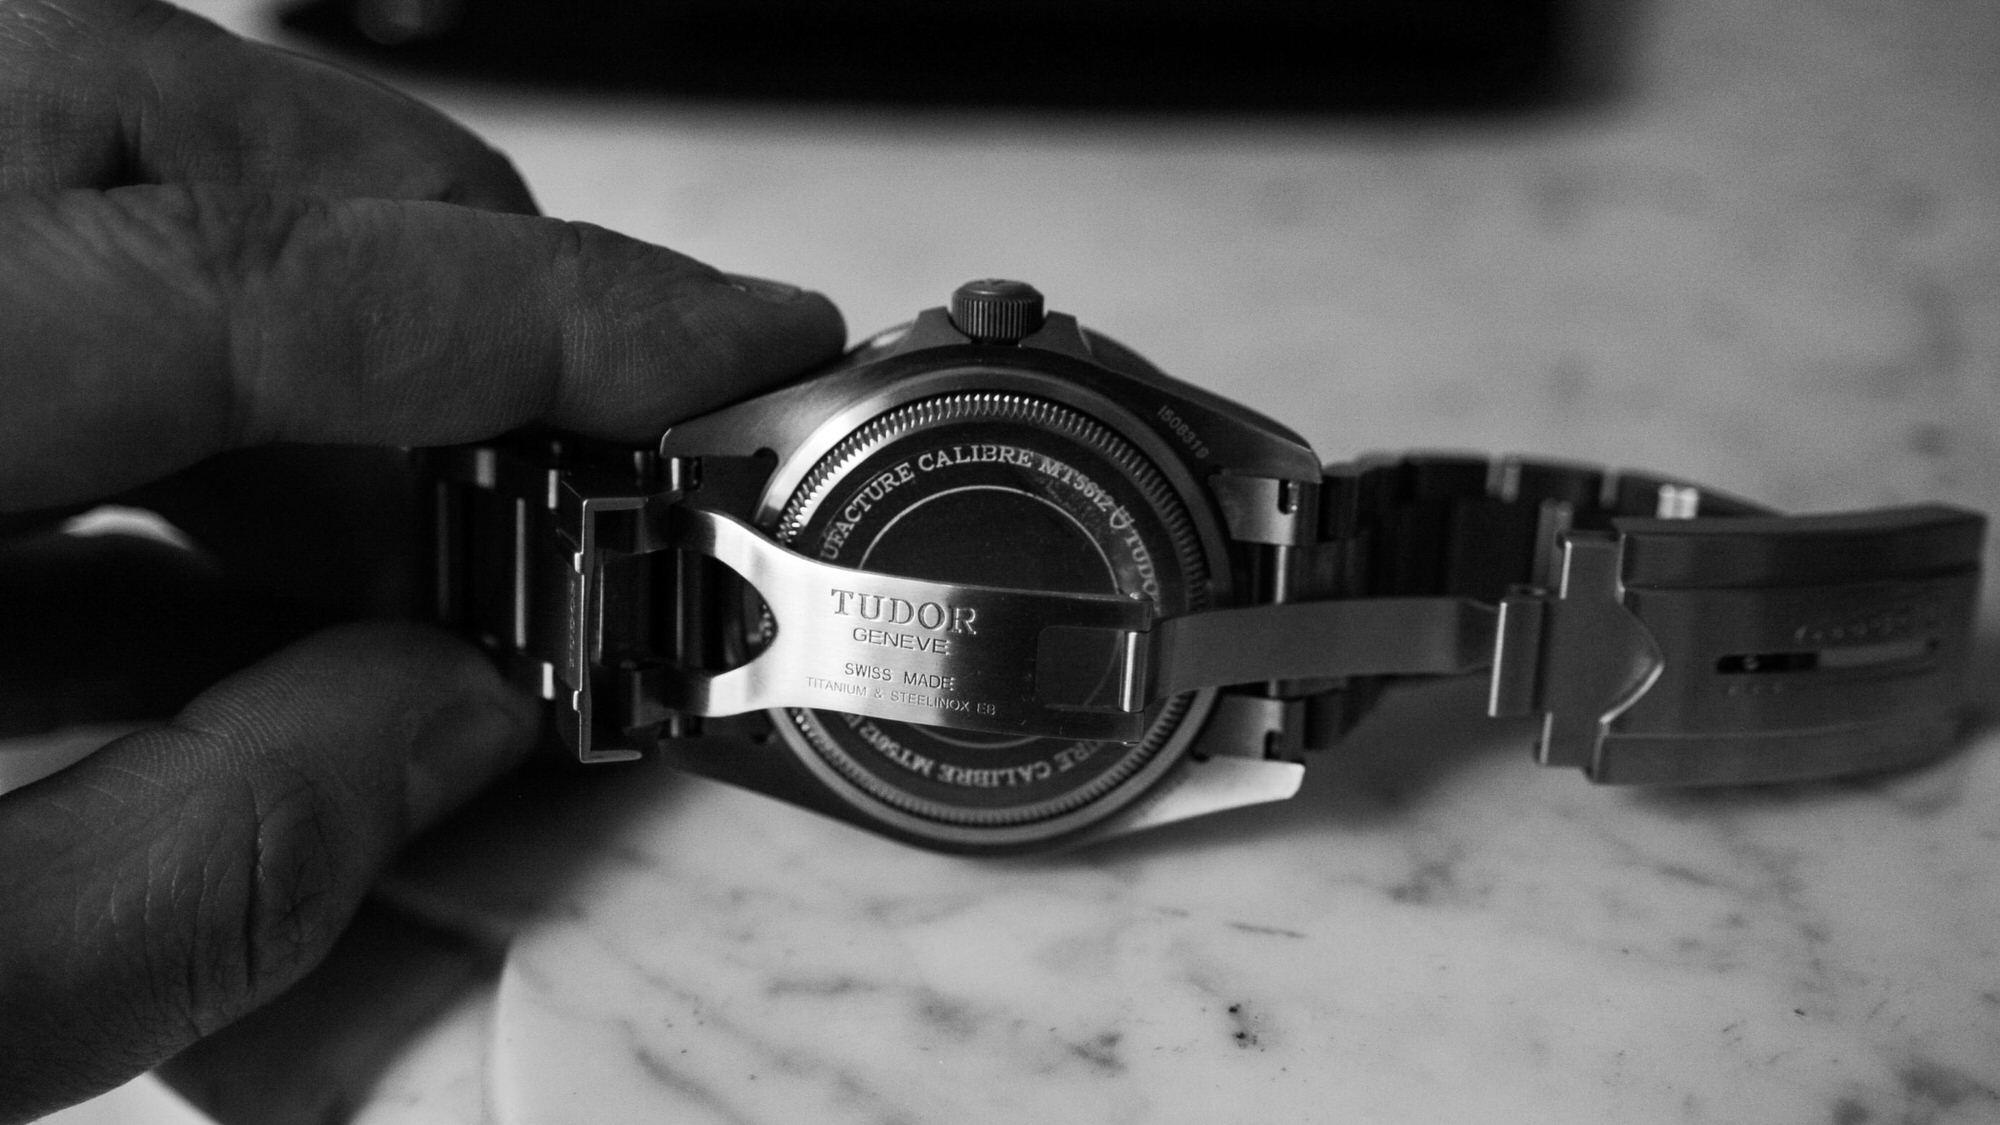 tudor geneve montre bracelet